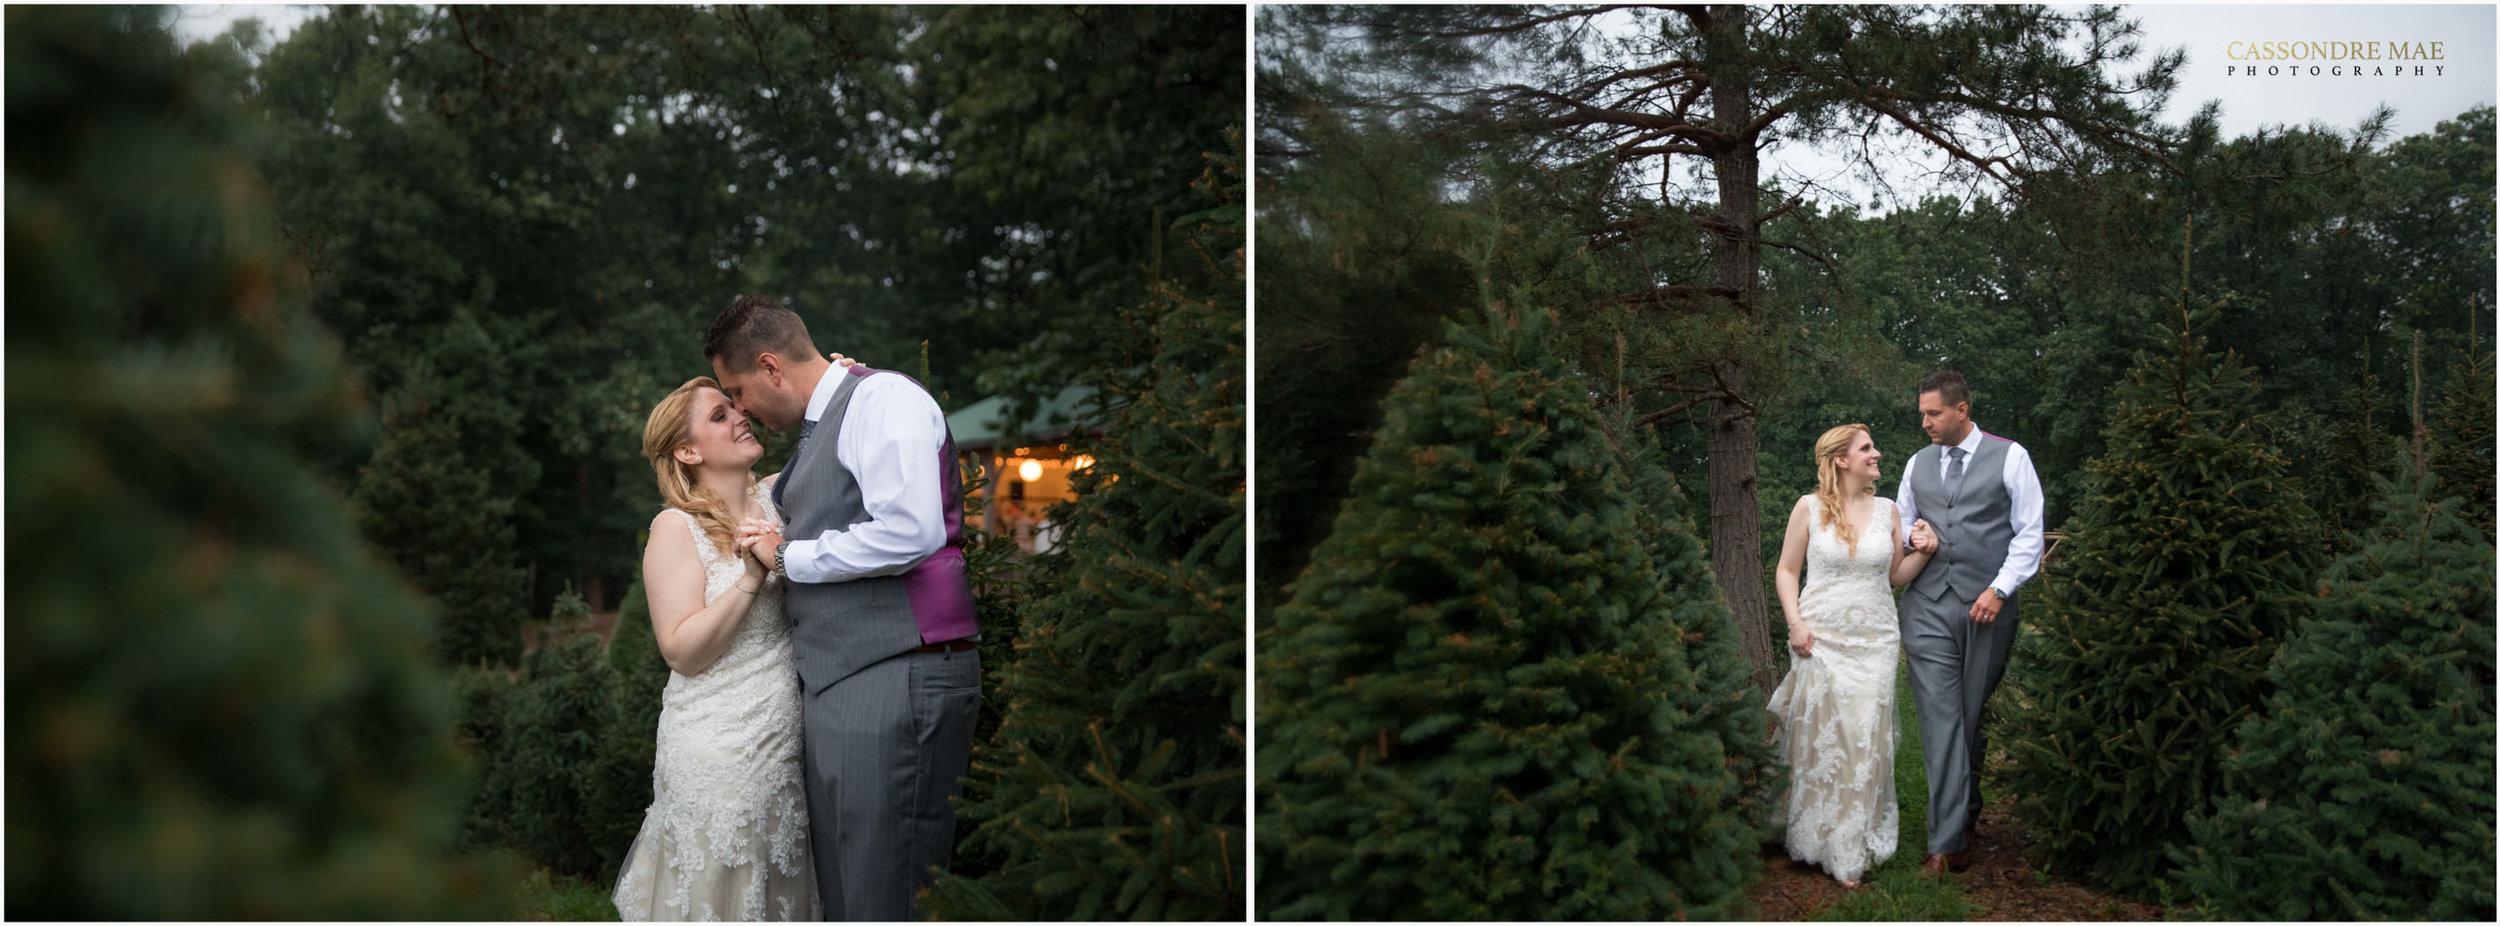 Cassondre Mae Photography Emmerich Tree Farm Wedding 32.jpg